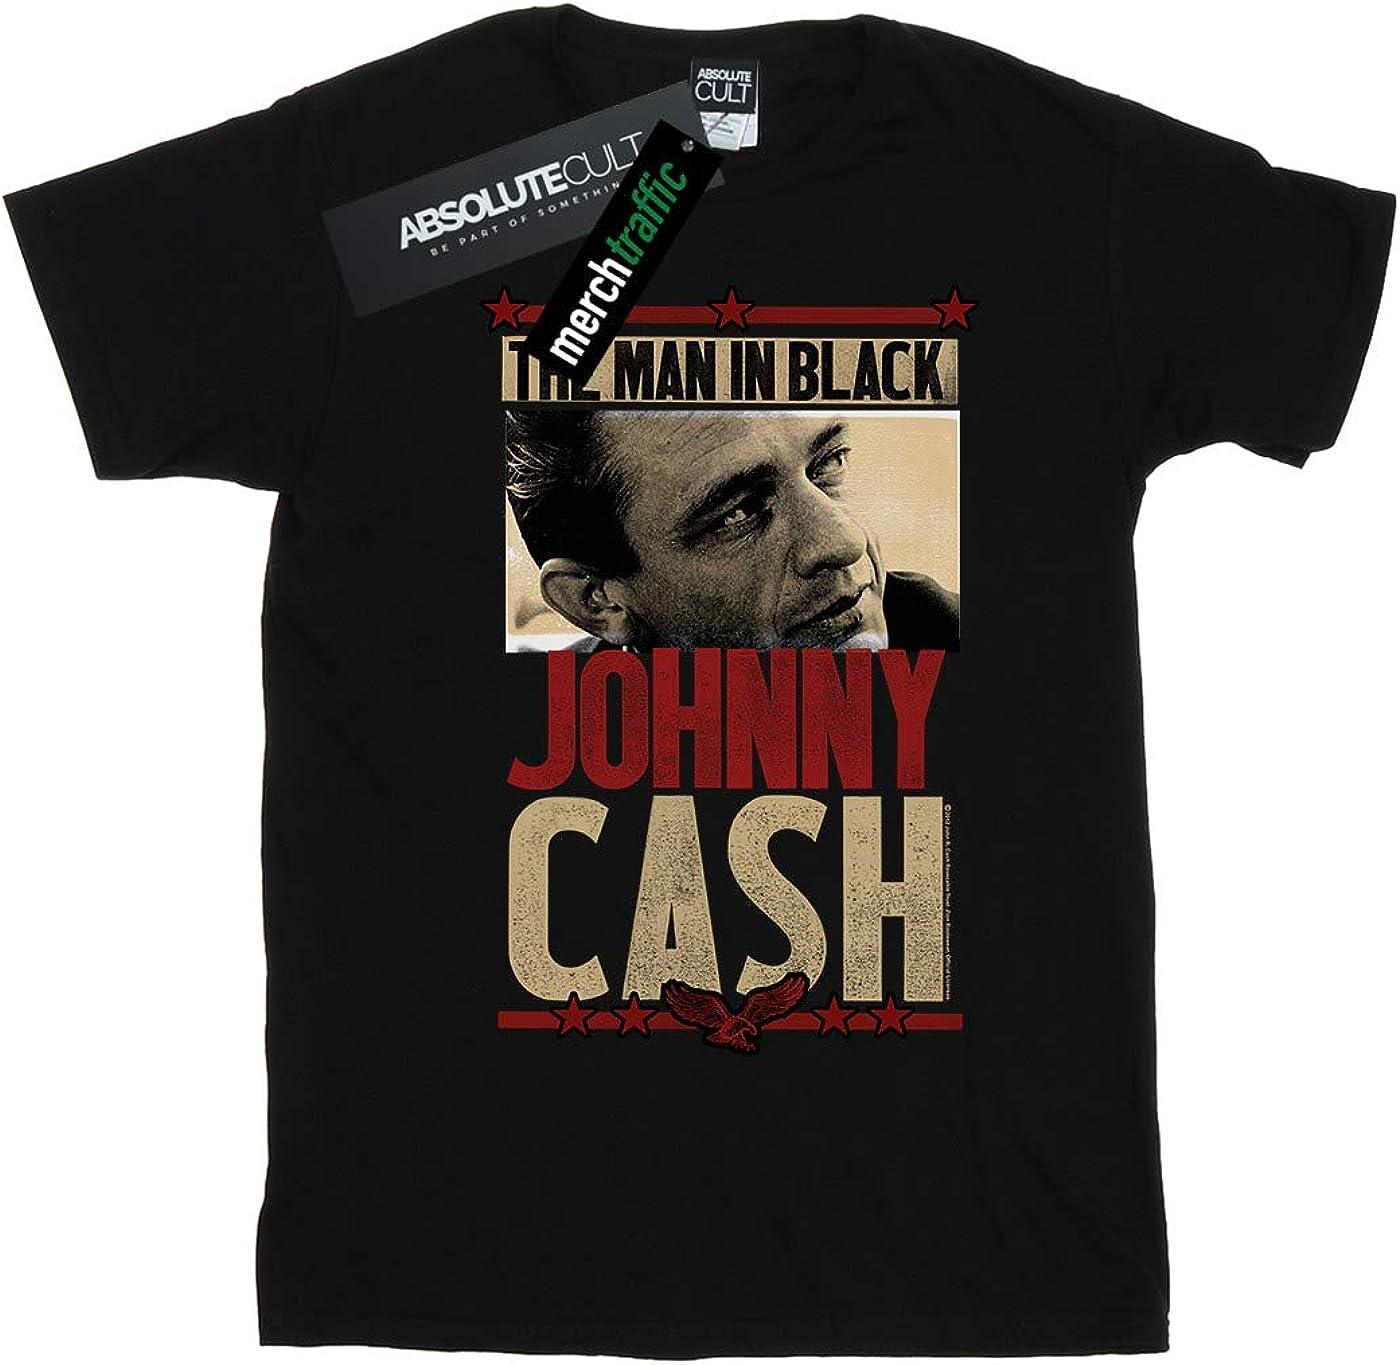 Johnny Cash Boys Man In Black Photo T-Shirt Black 5-6 Years